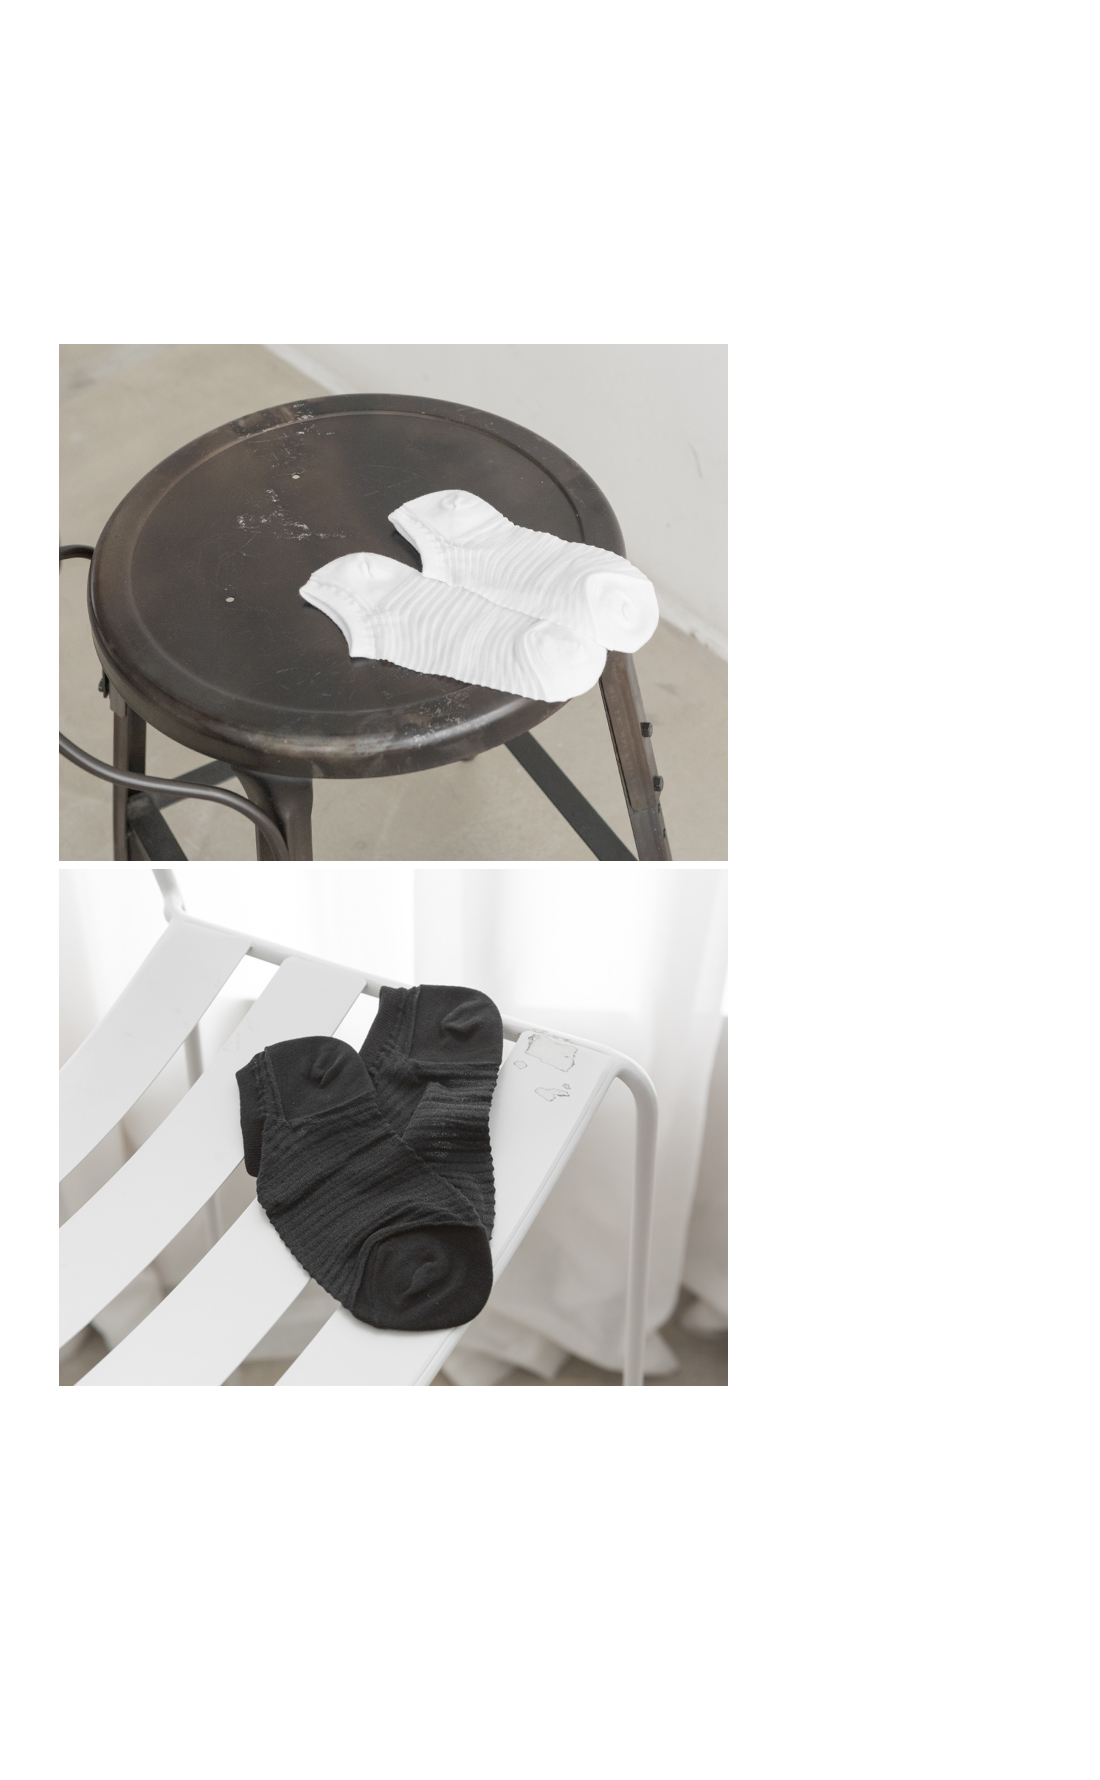 Onet summer see-through socks #84092